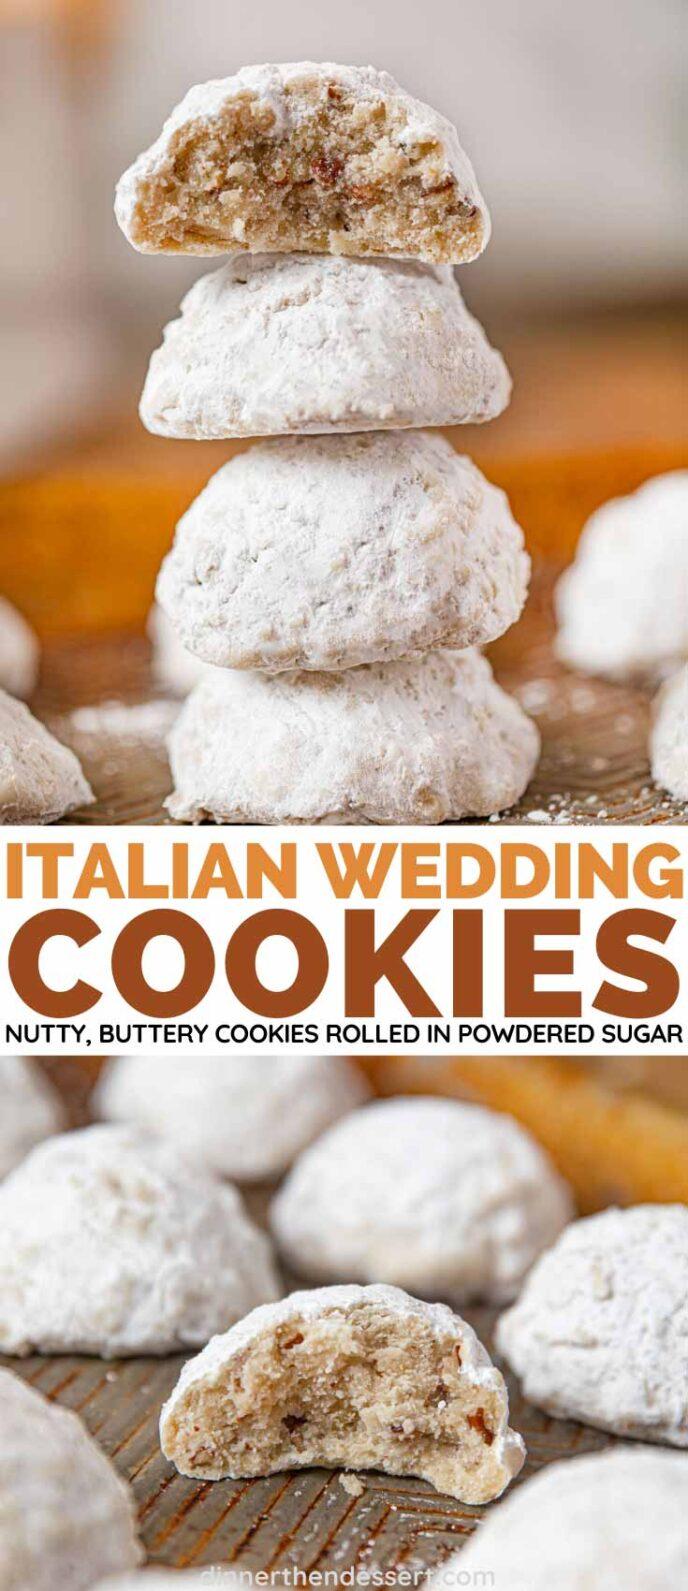 Italian Wedding Cookies collage